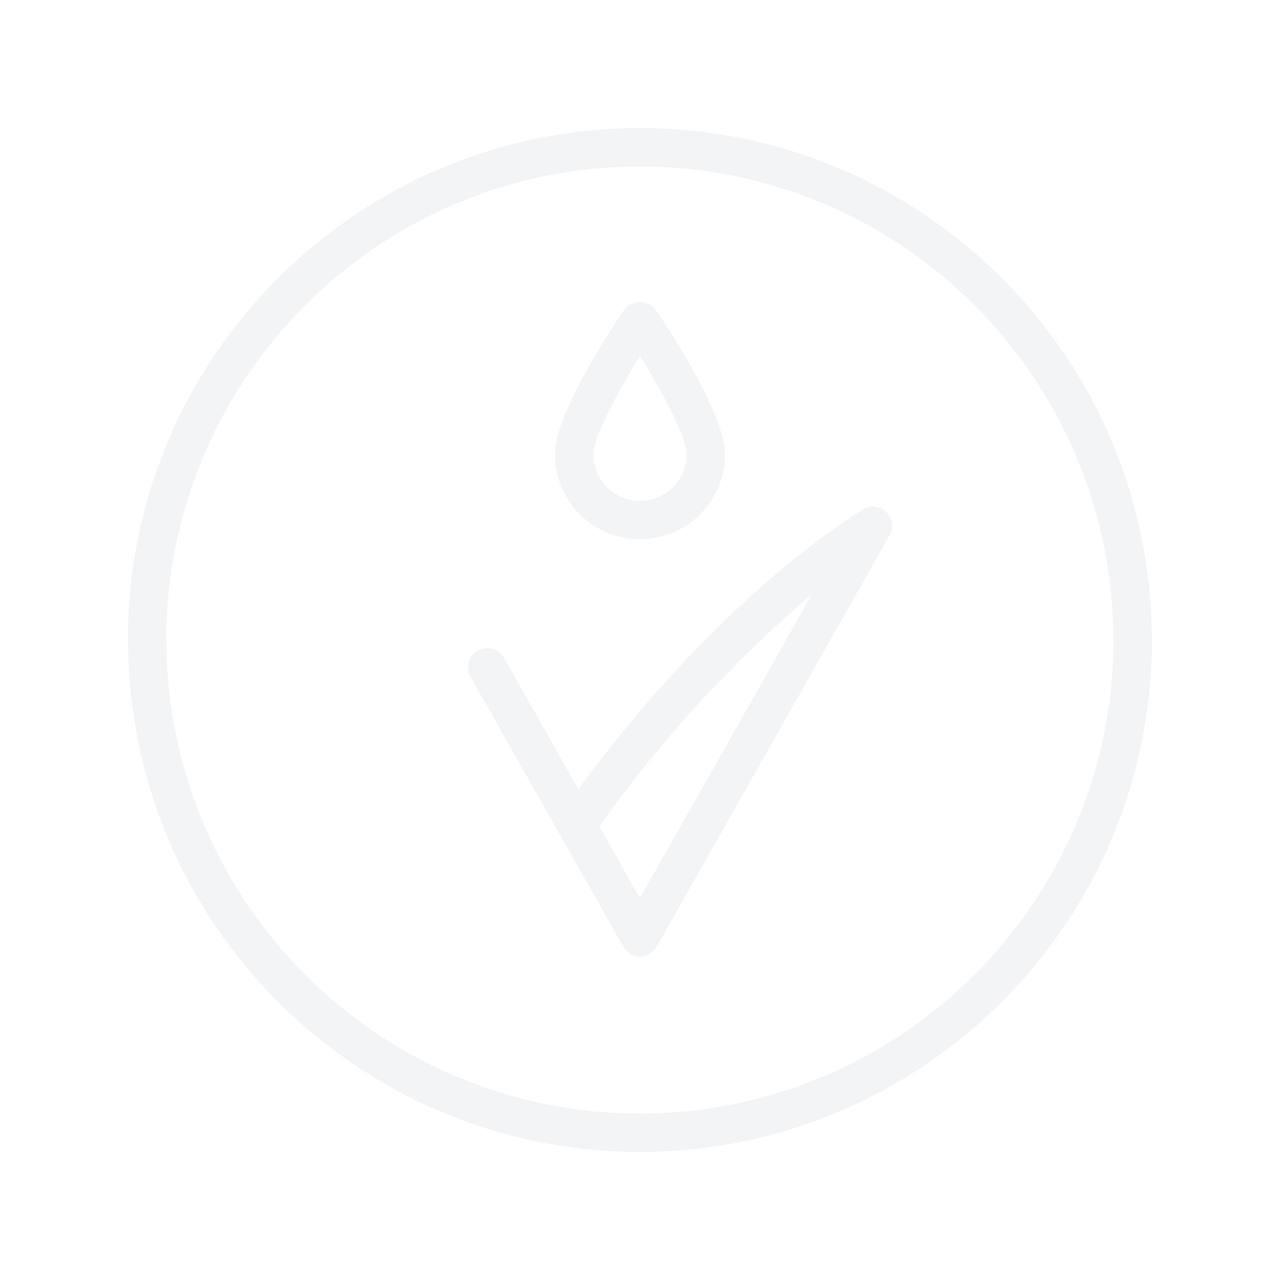 GLAMGLOW Powermud Dualcleanse Treatment 50g